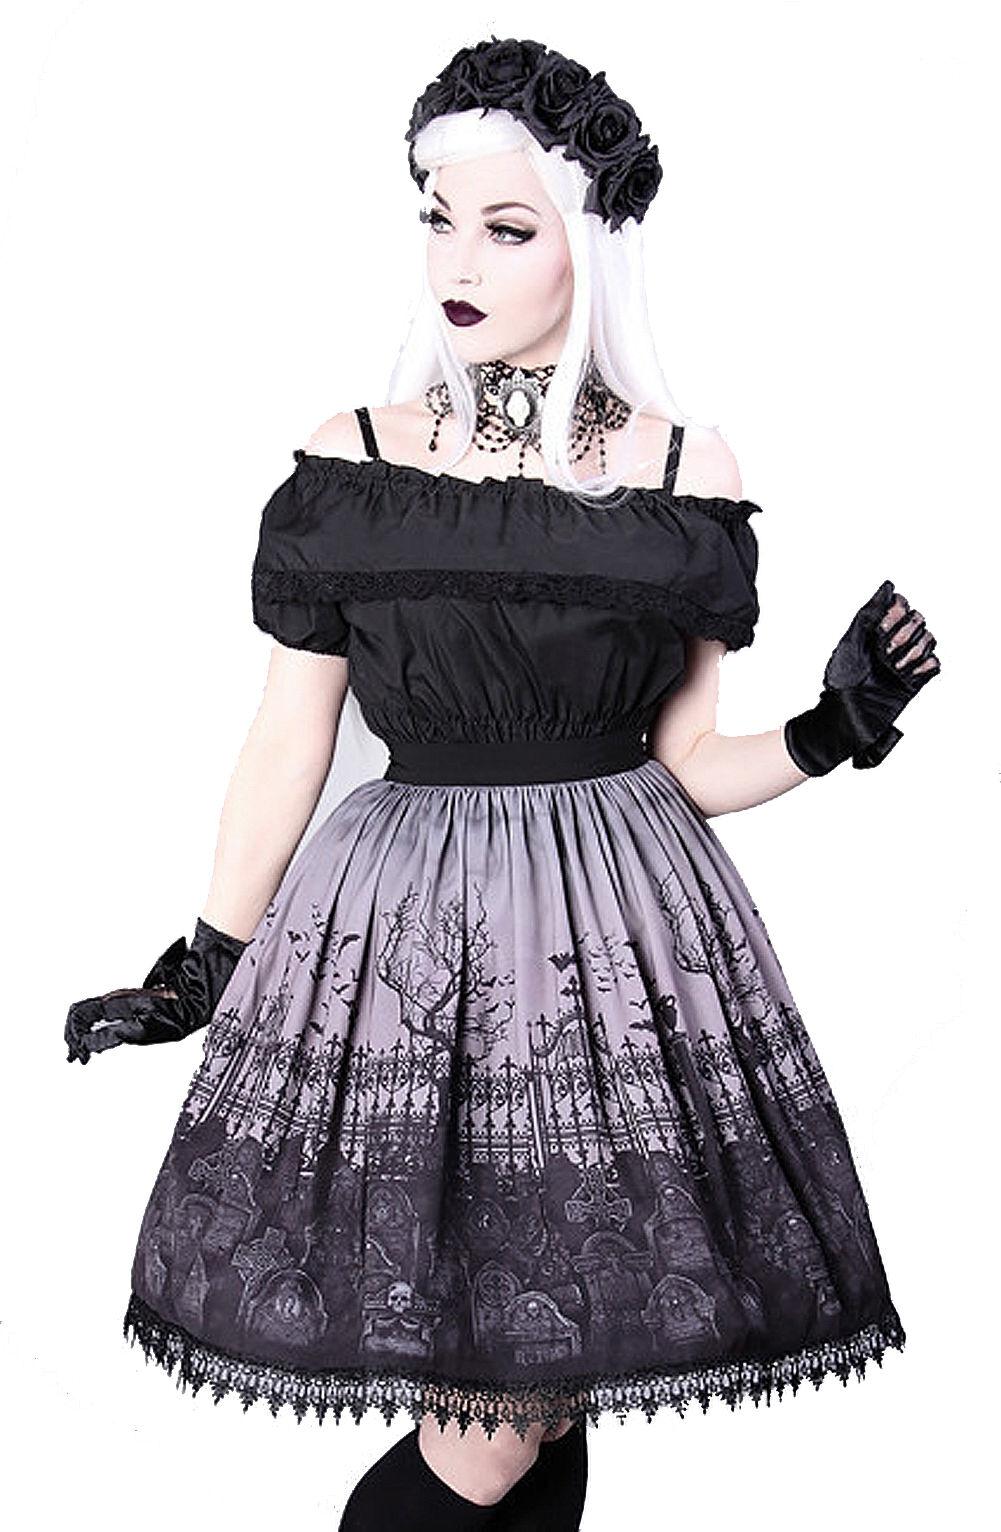 Restyle -  CEMETERY grau SKIRT - Größes S - XXL   Gothic Lolita Skirt